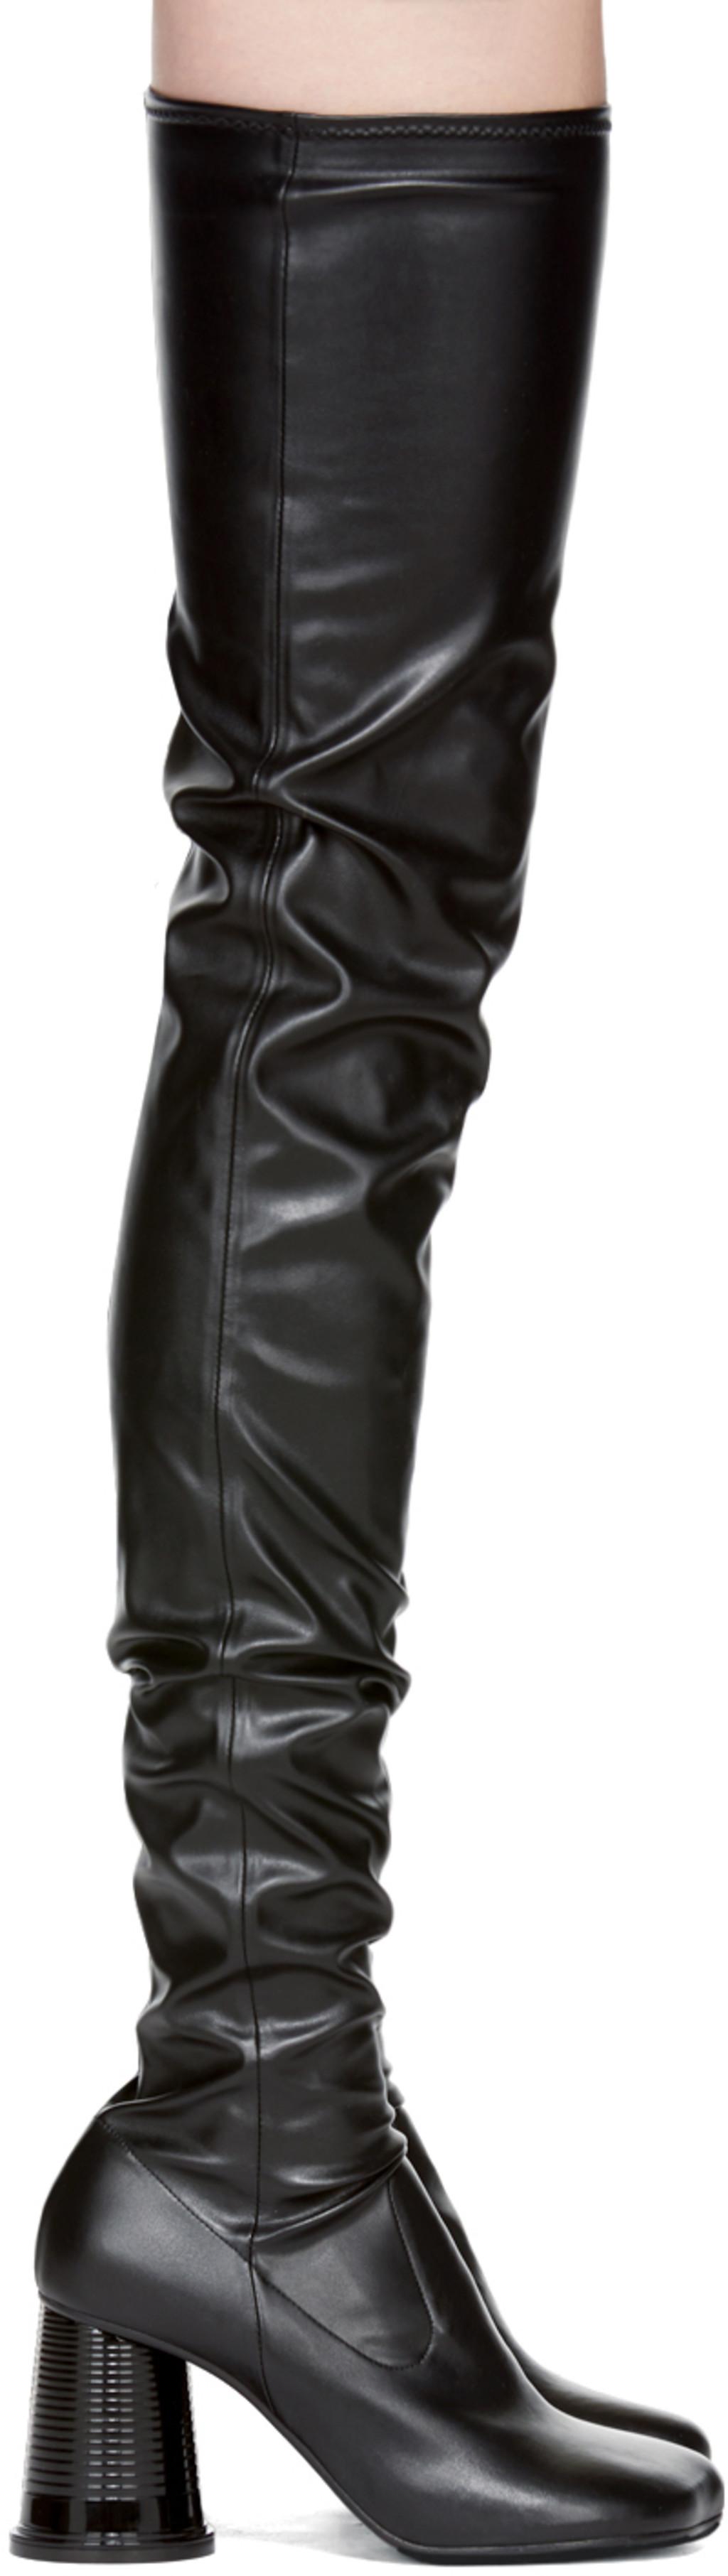 Burberry Black Ballerina Over-the-Knee Boots ljqmHkiA9